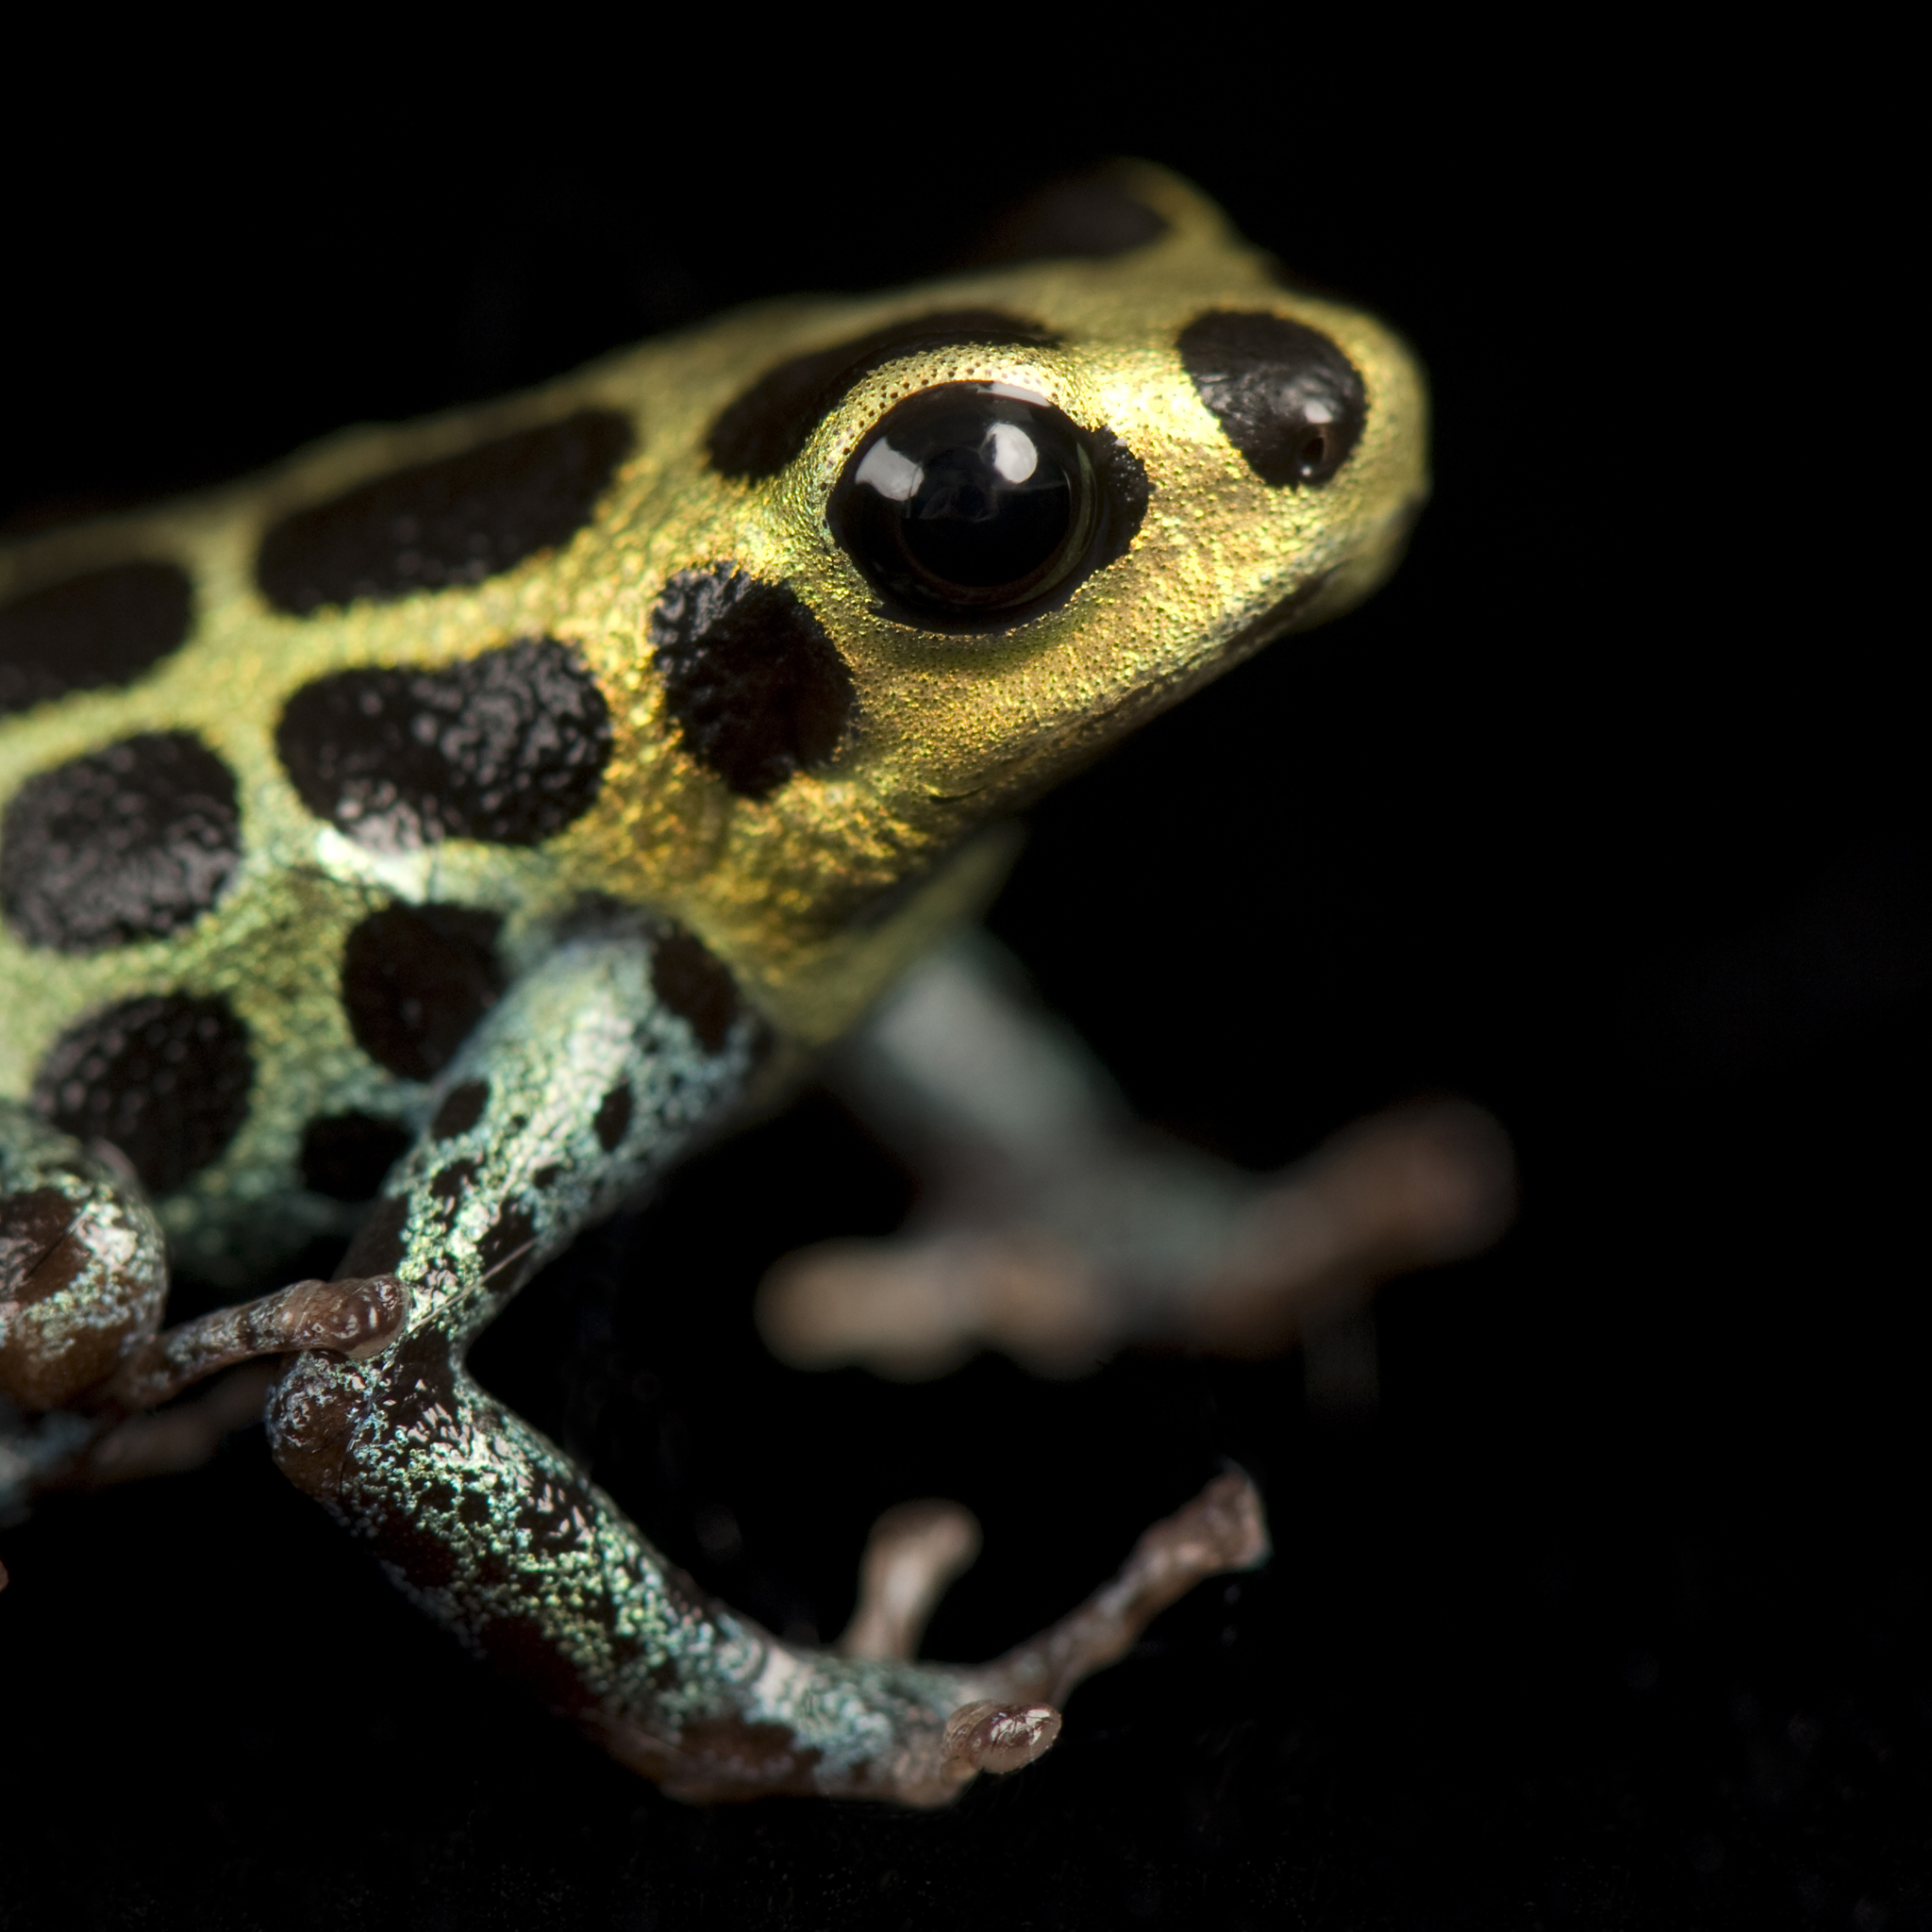 High Resolution Wallpaper   Poison Dart Frog 2048x2048 px